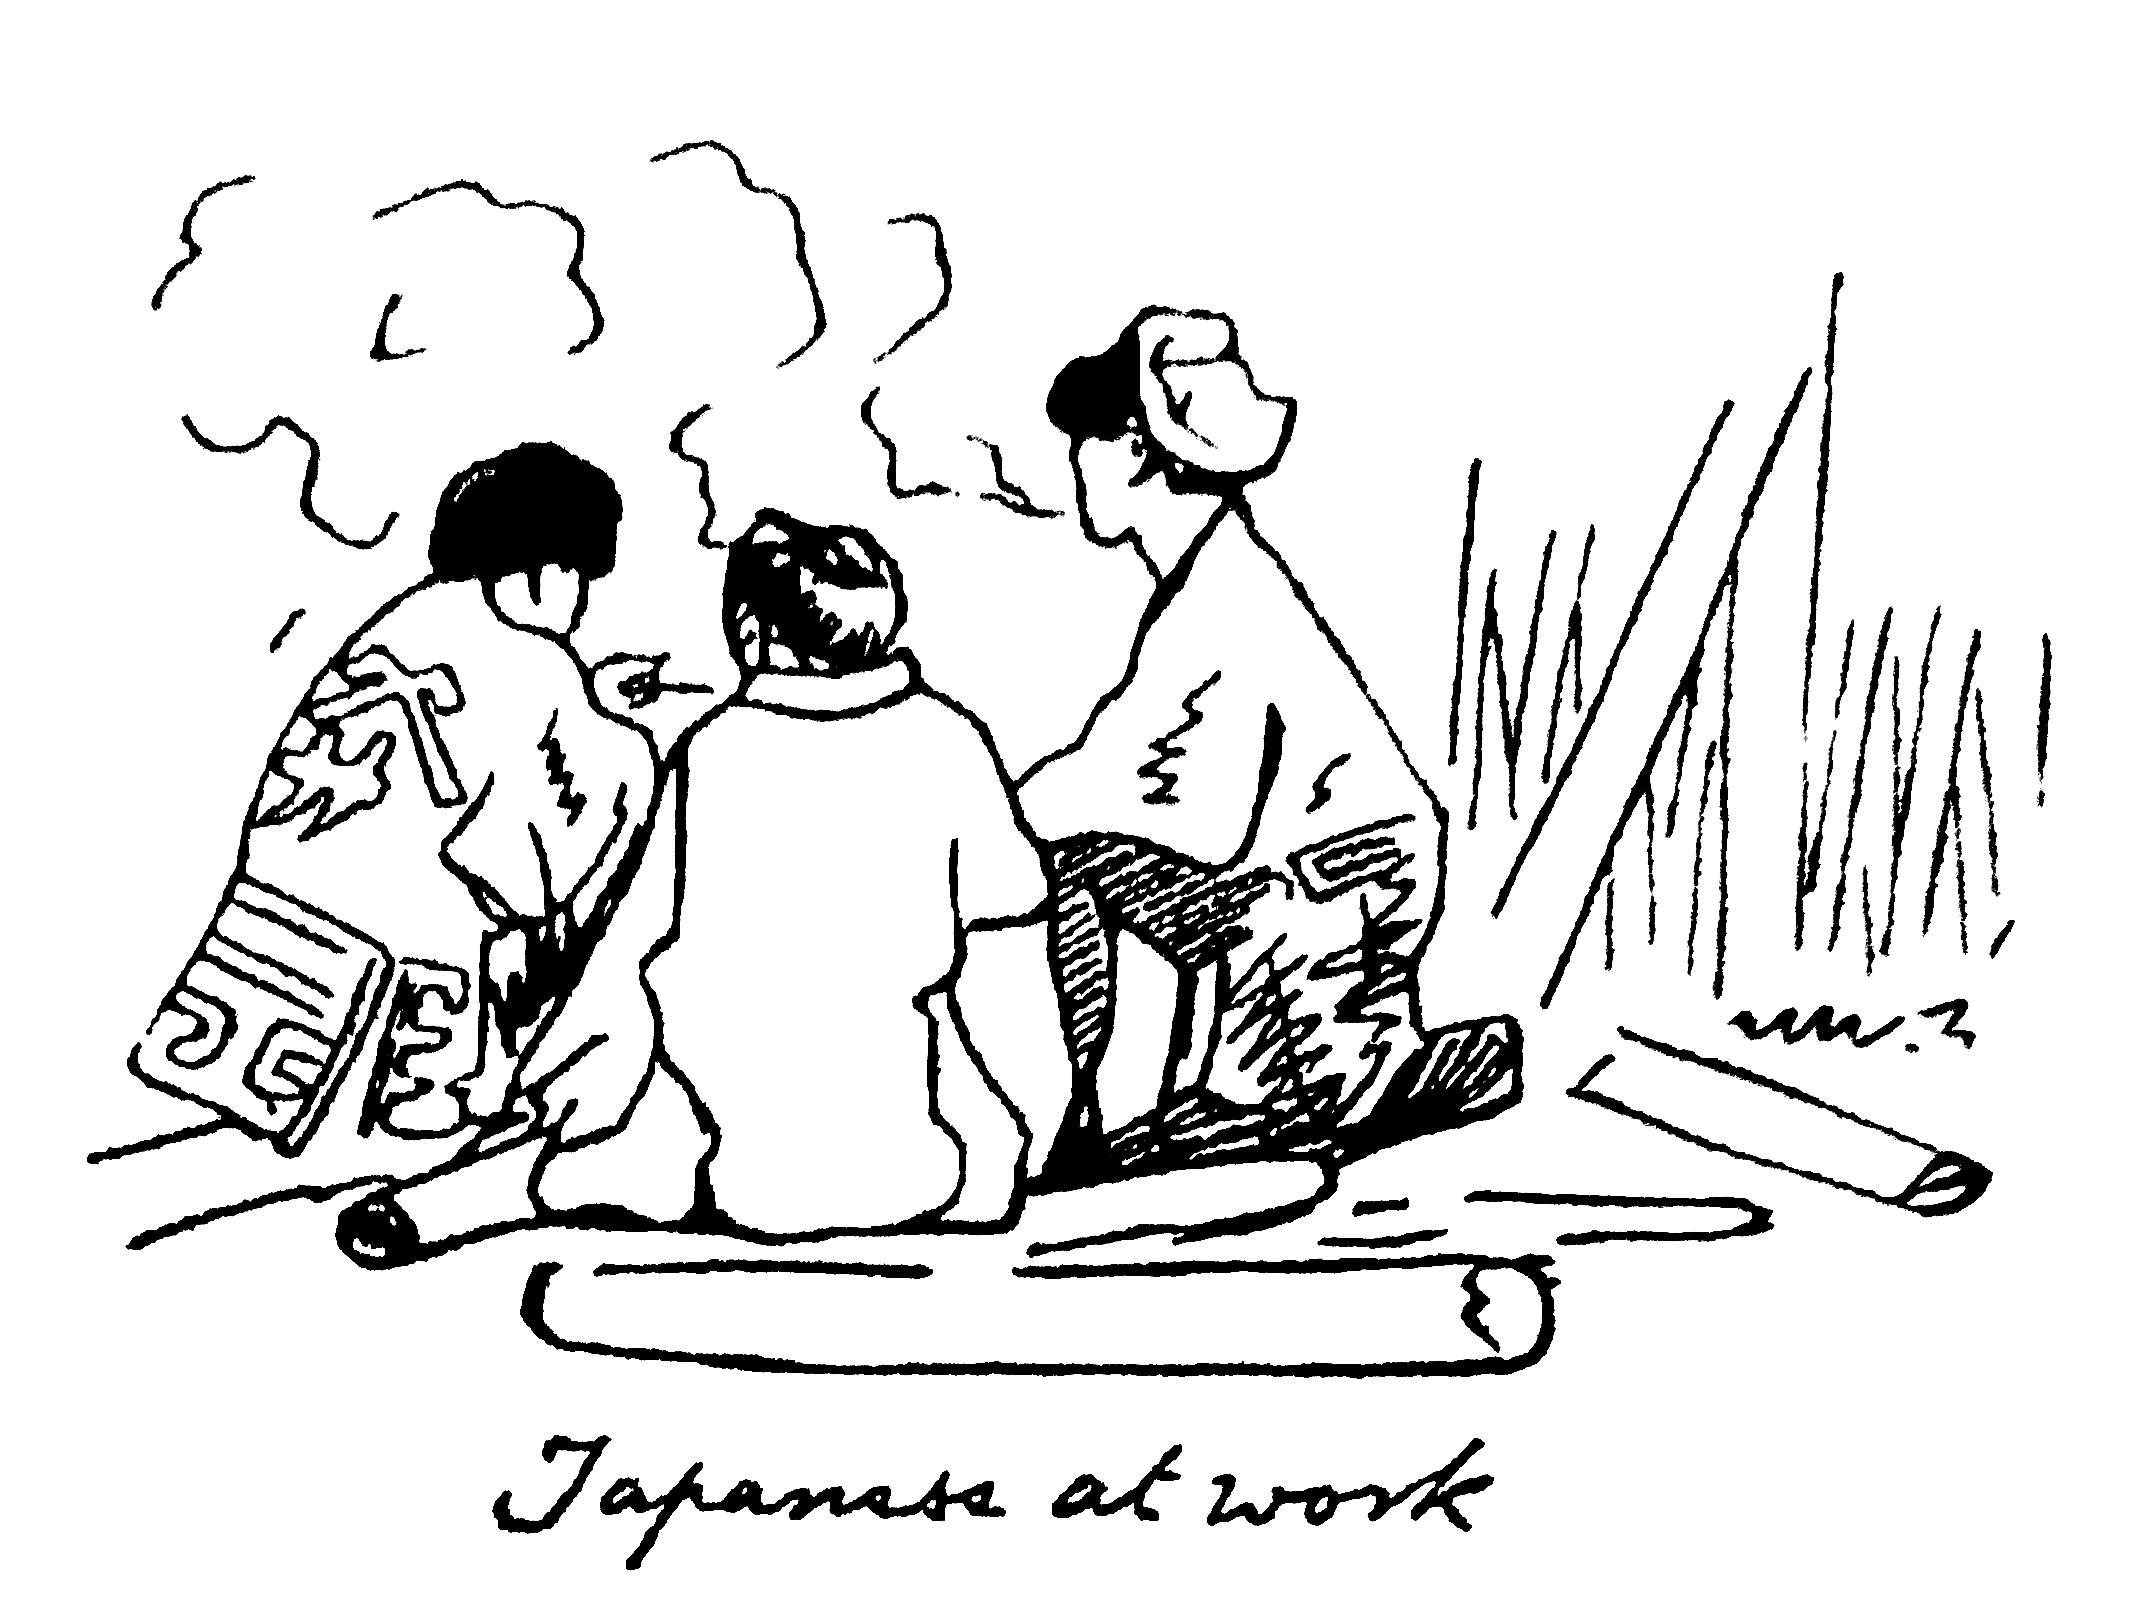 Japanese_at_work